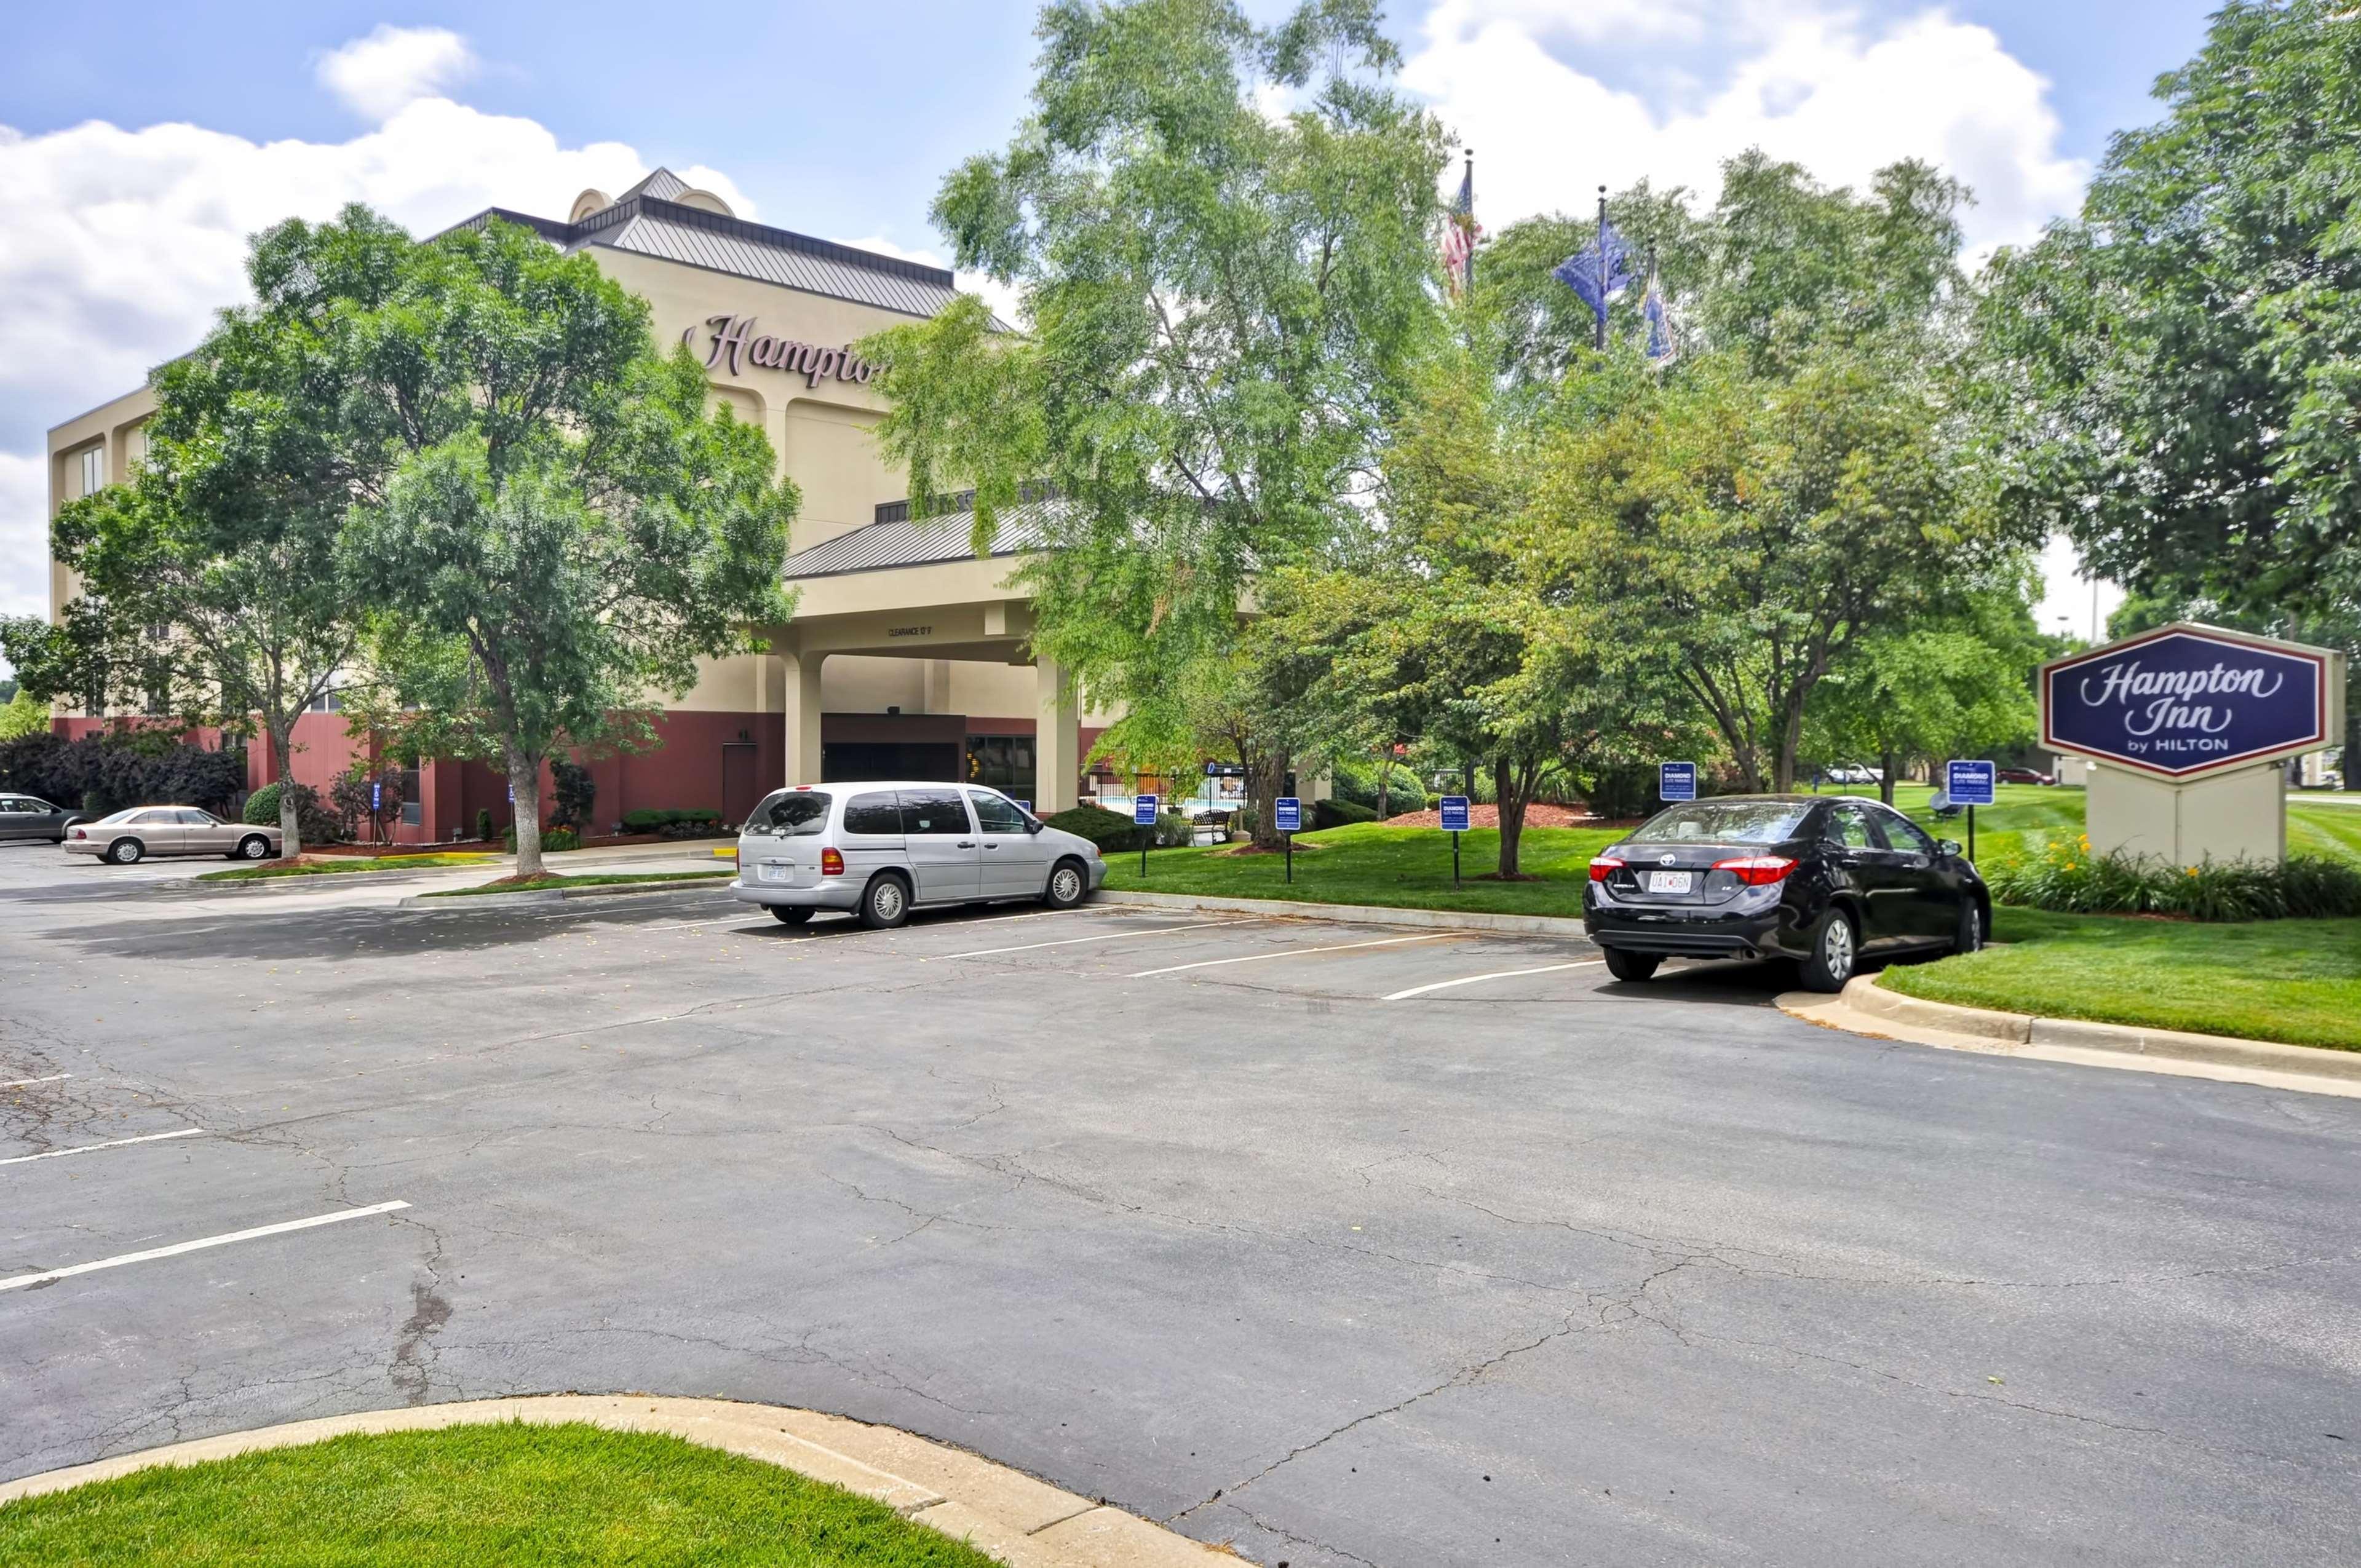 Hampton Inn Kansas City/Overland Park image 33